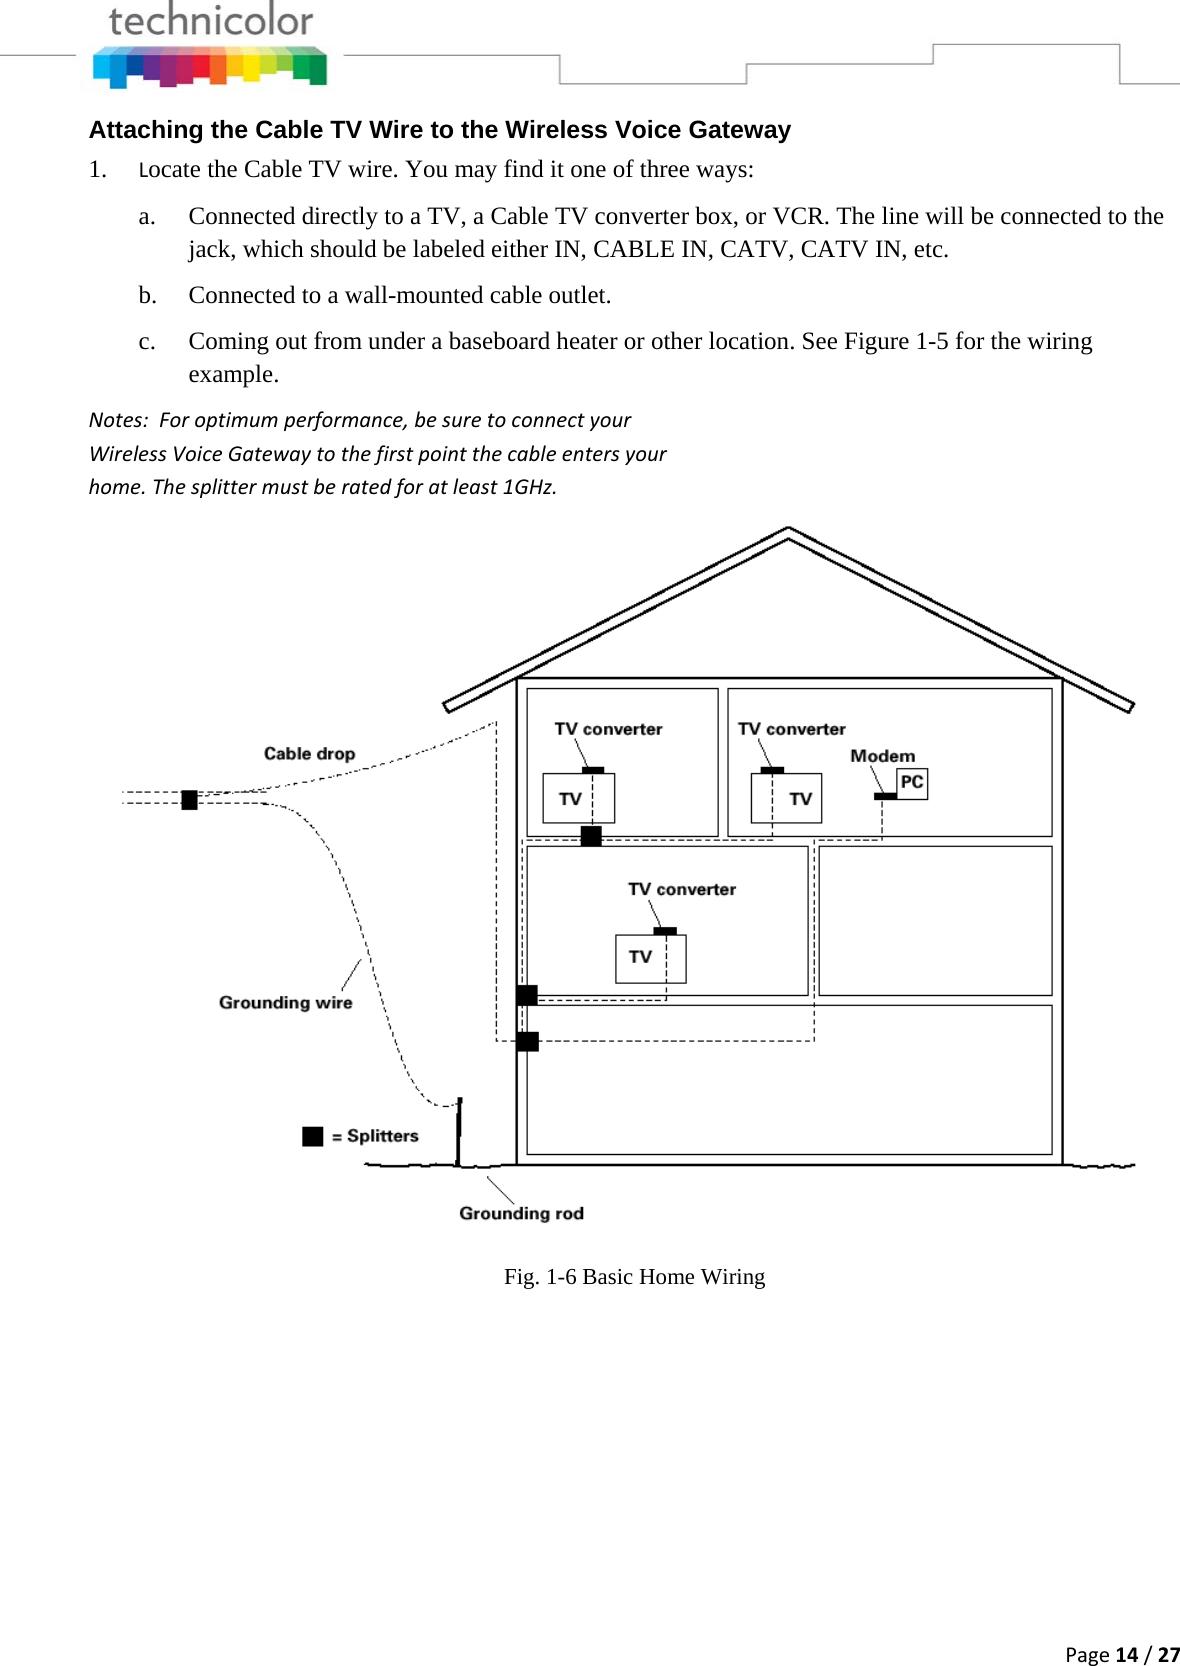 Optimum Wiring Diagrams Home Cable Tv Diagram Realfixesrealfast Automotive